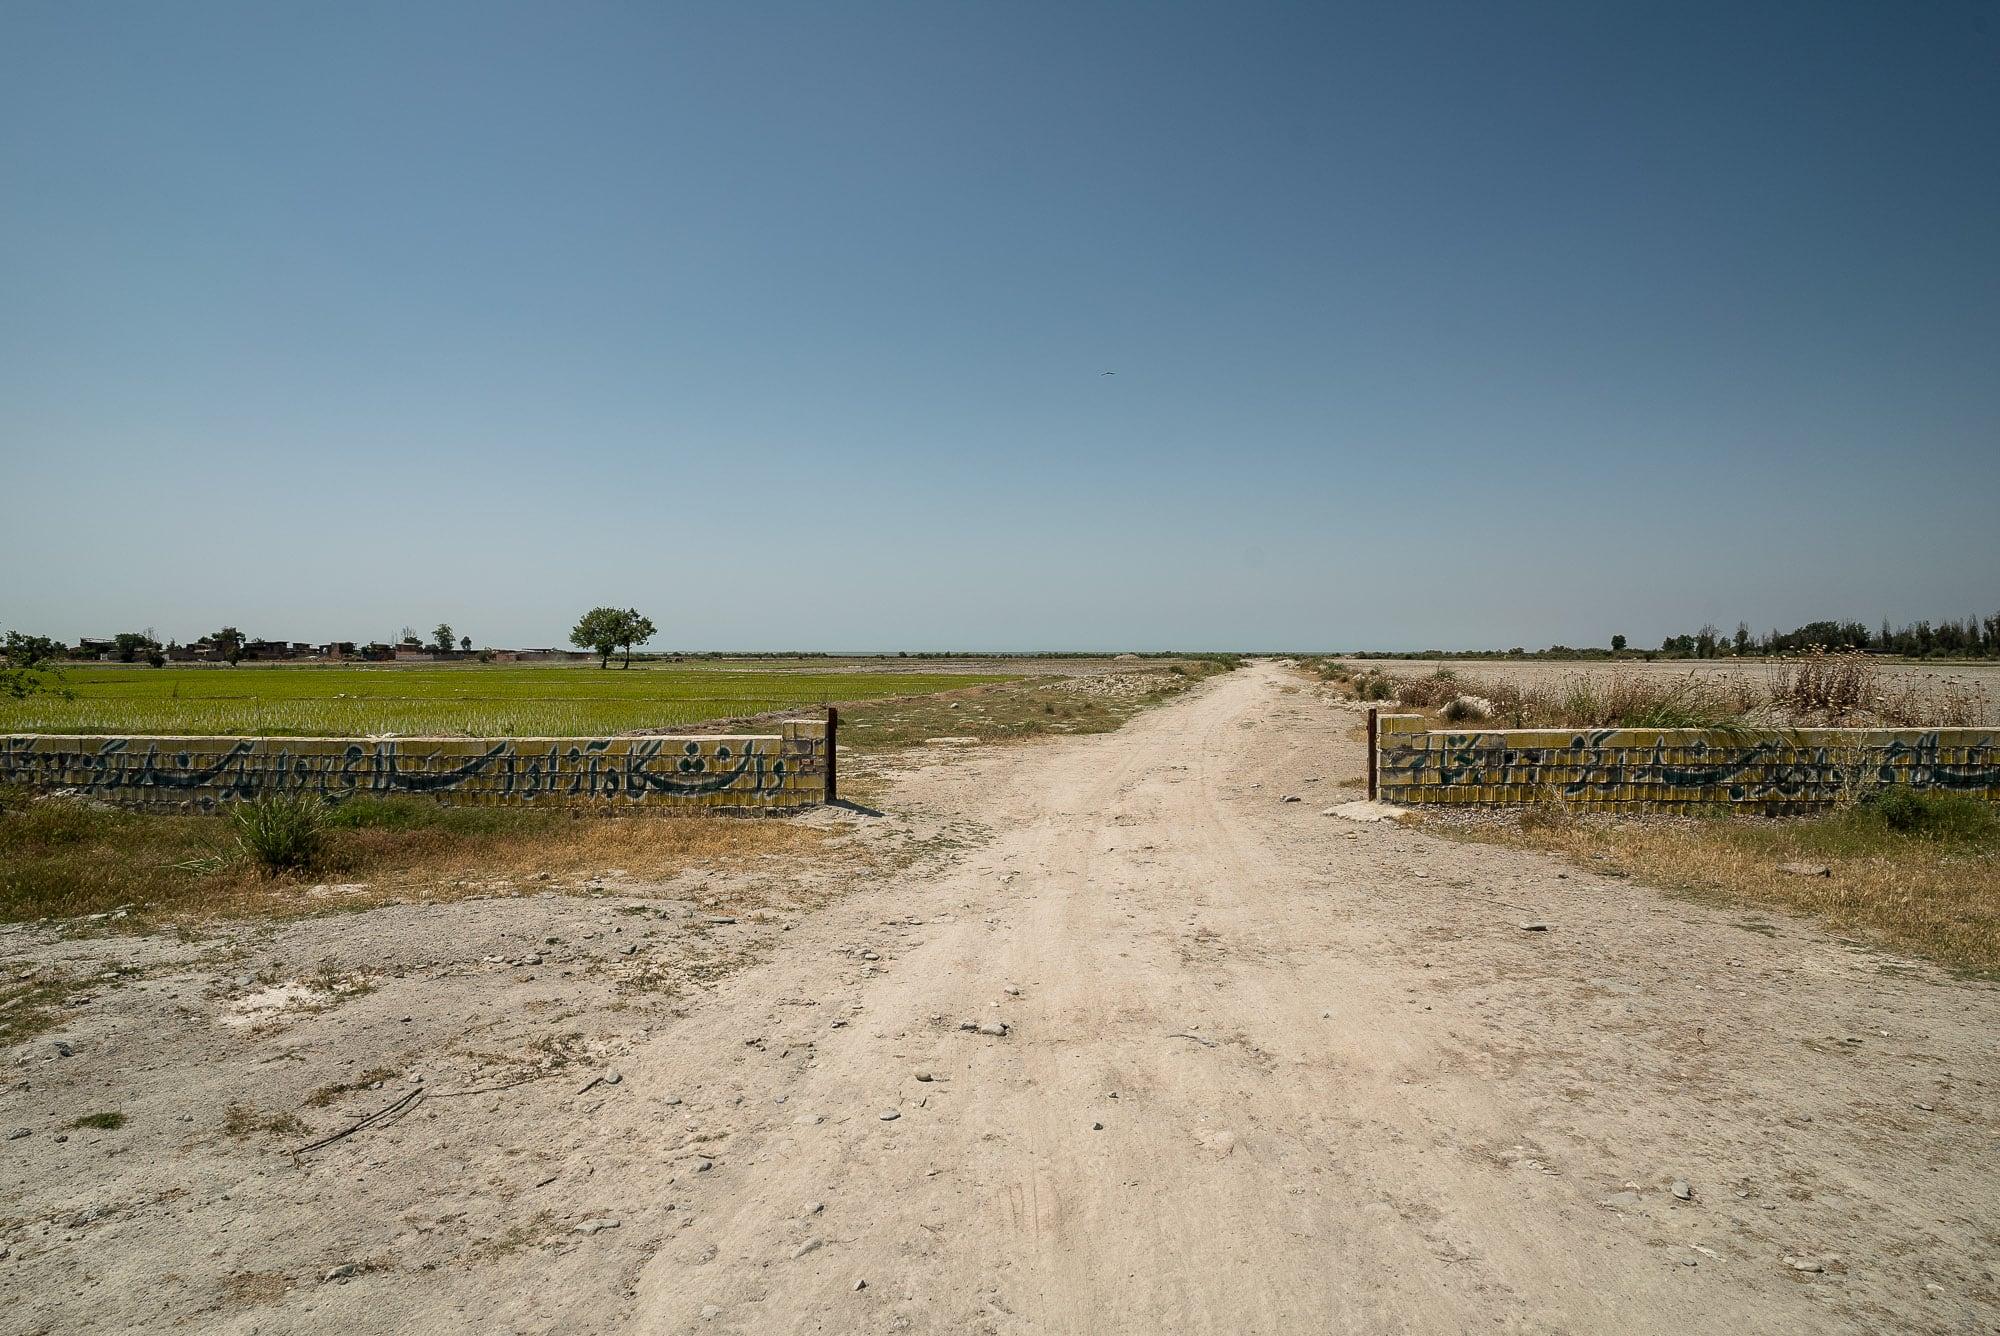 path to the Caspian Sea